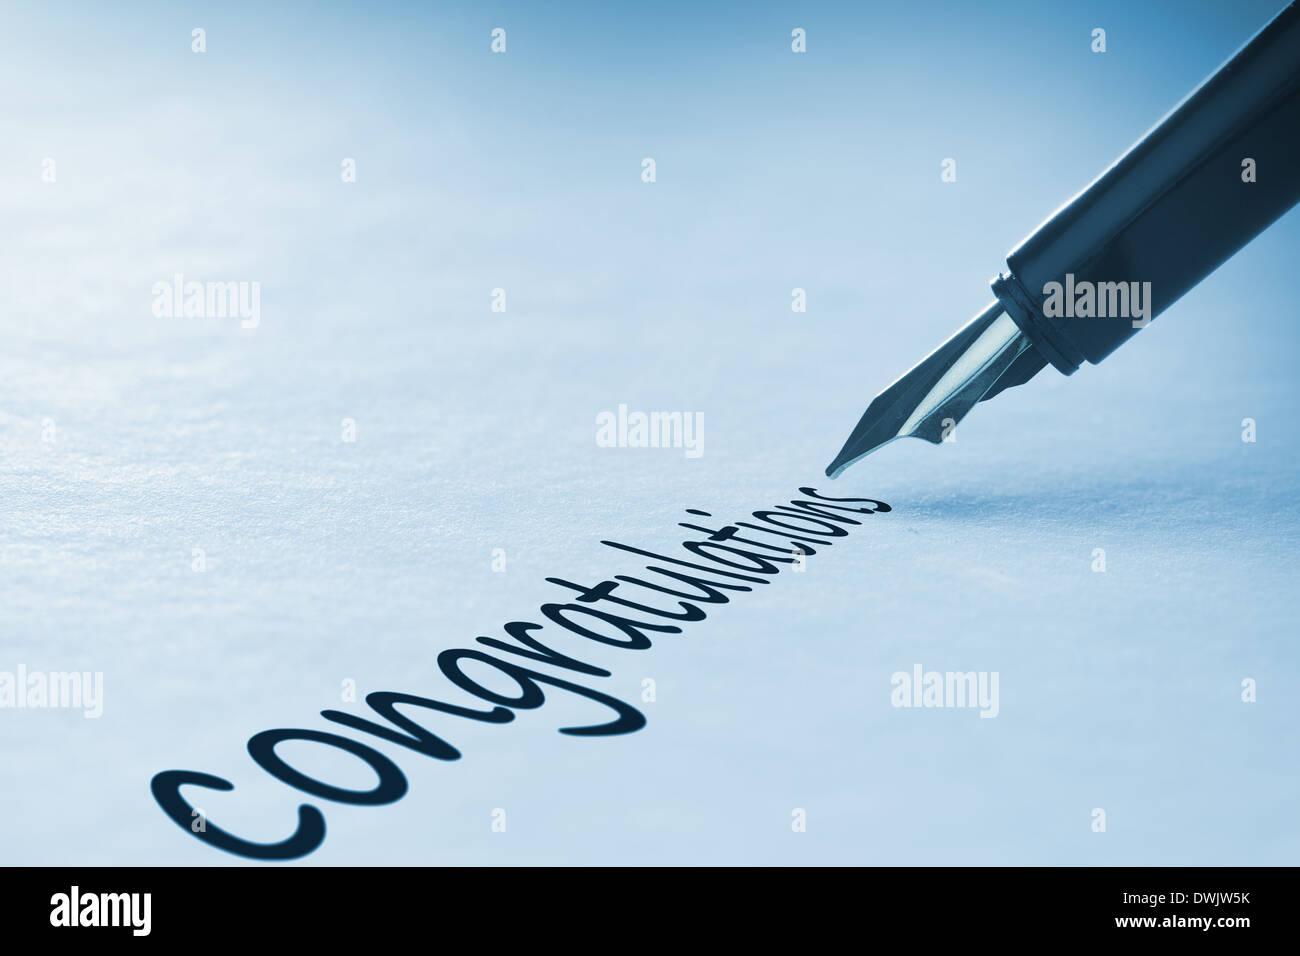 Fountain pen writing Congratulations - Stock Image